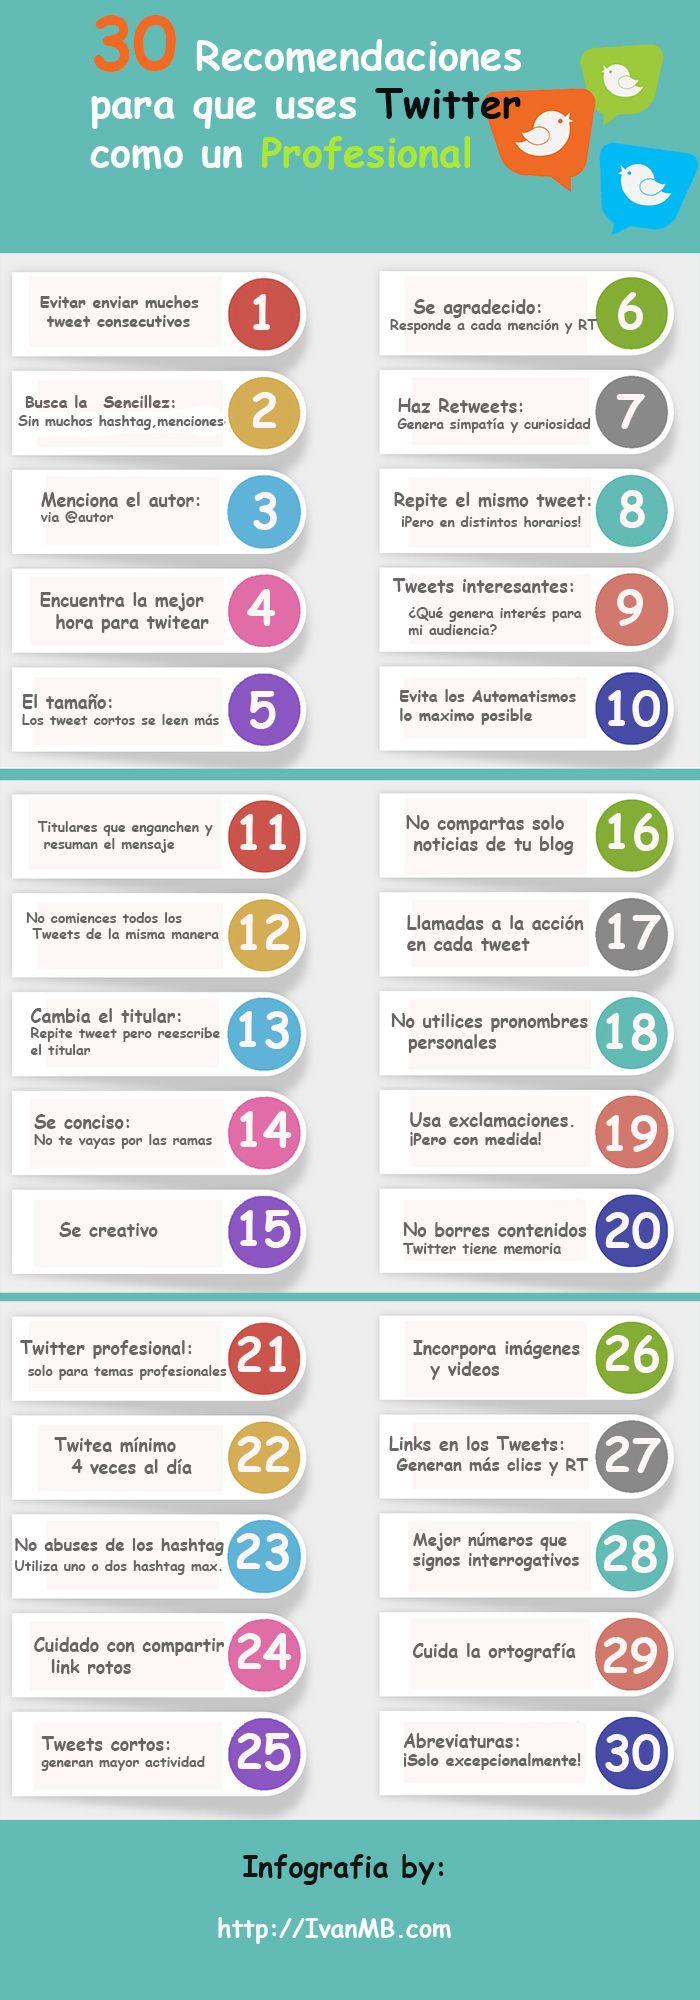 30 RECOMENDACIONES PARA USAR TWITTER COMO UN PROFESIONAL #INFOGRAFIA #INFOGRAPHIC #SOCIALMEDIA